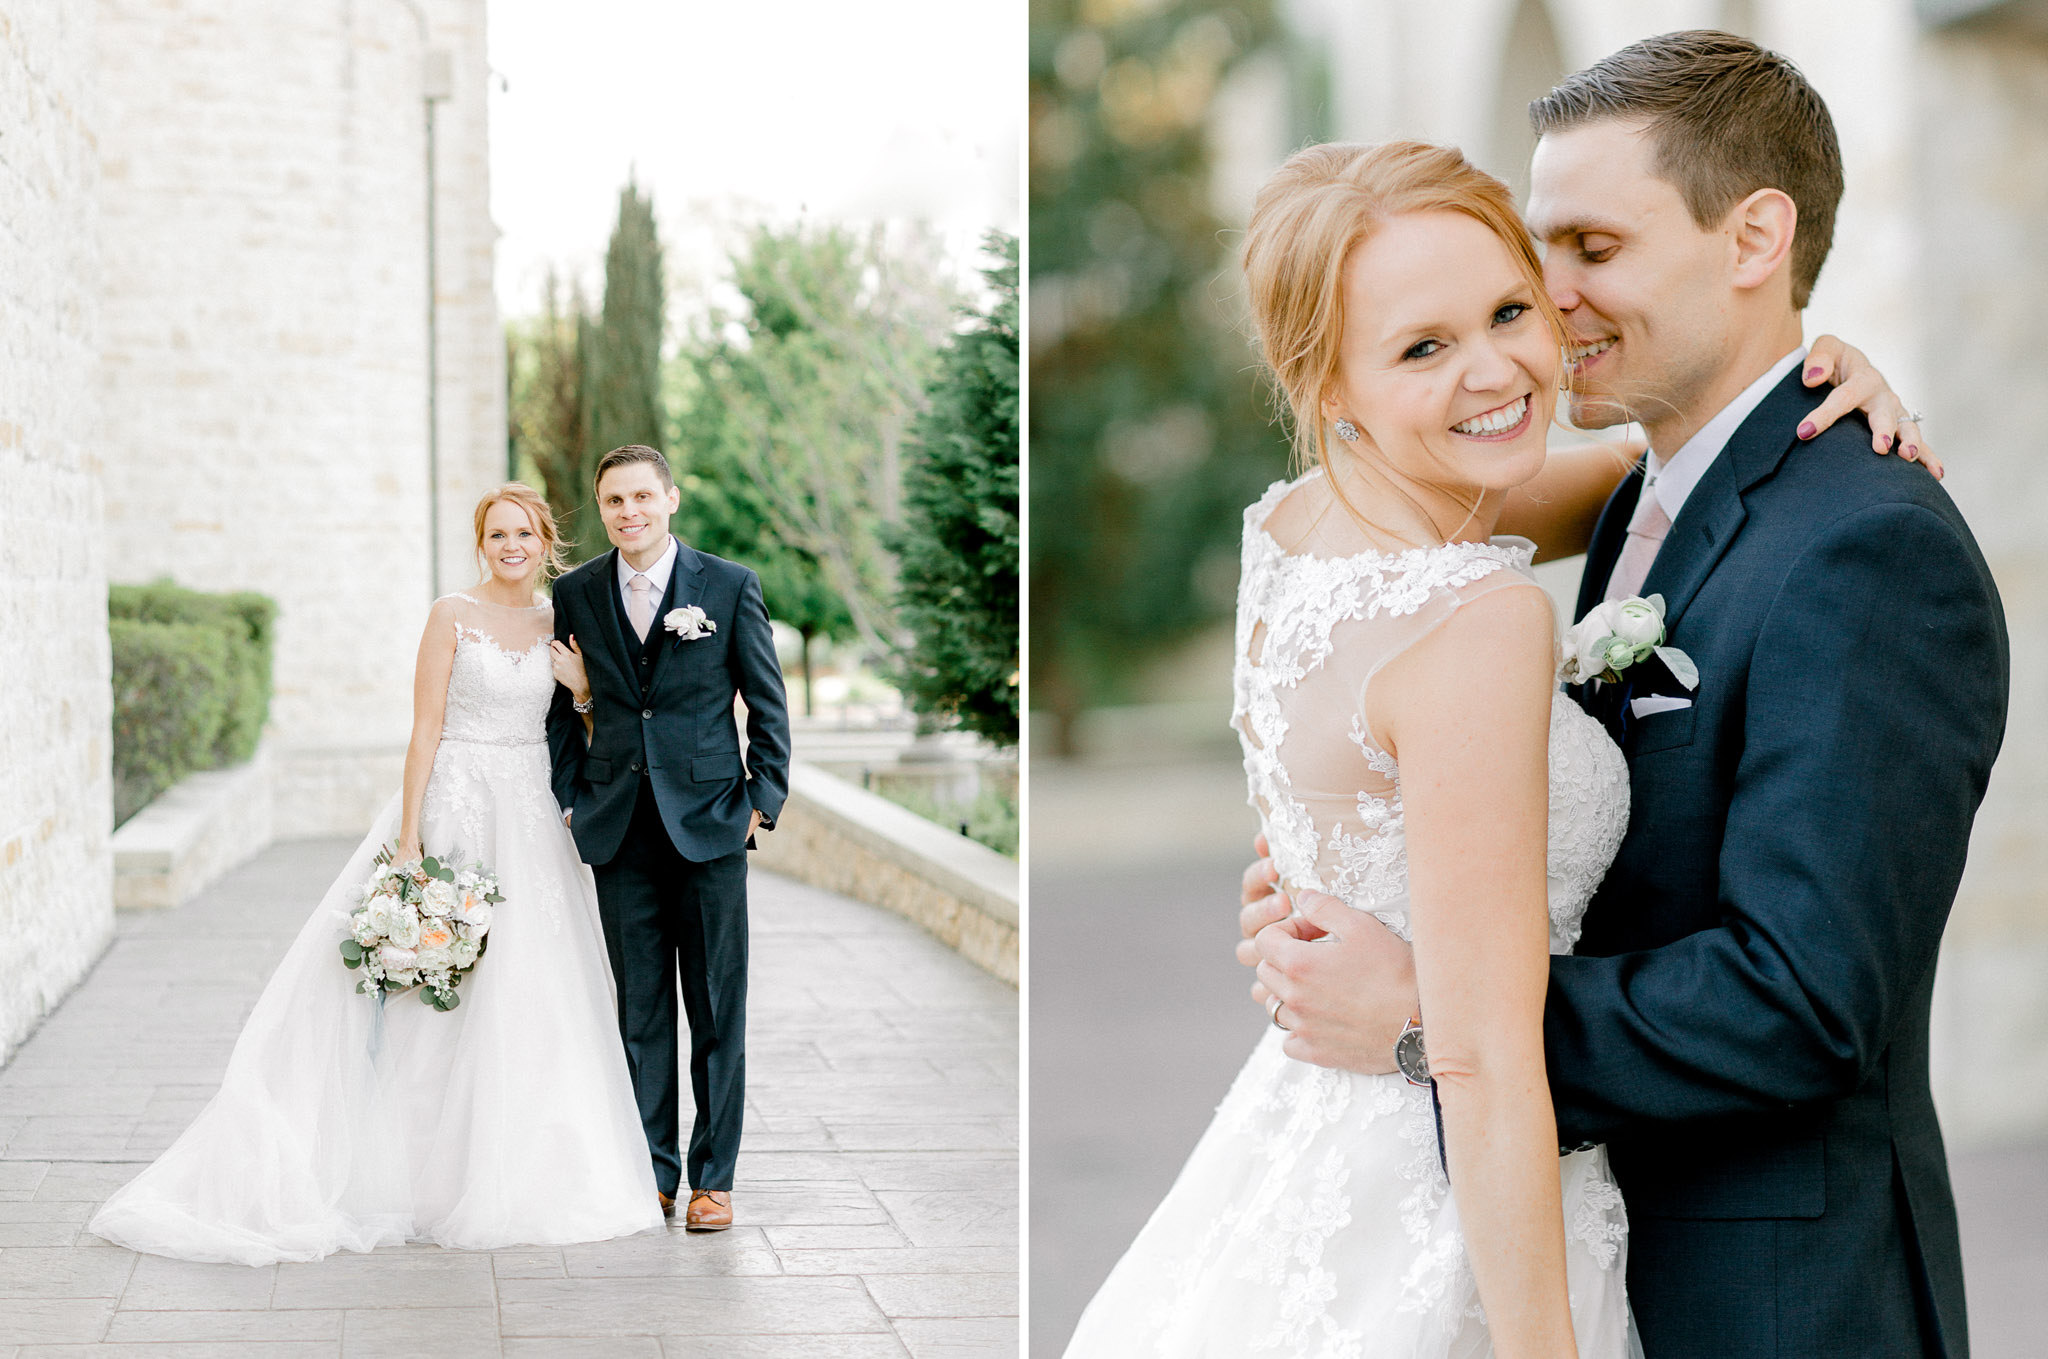 Christ Chapel Bible Church Wedding Photos - Fine Art Photography